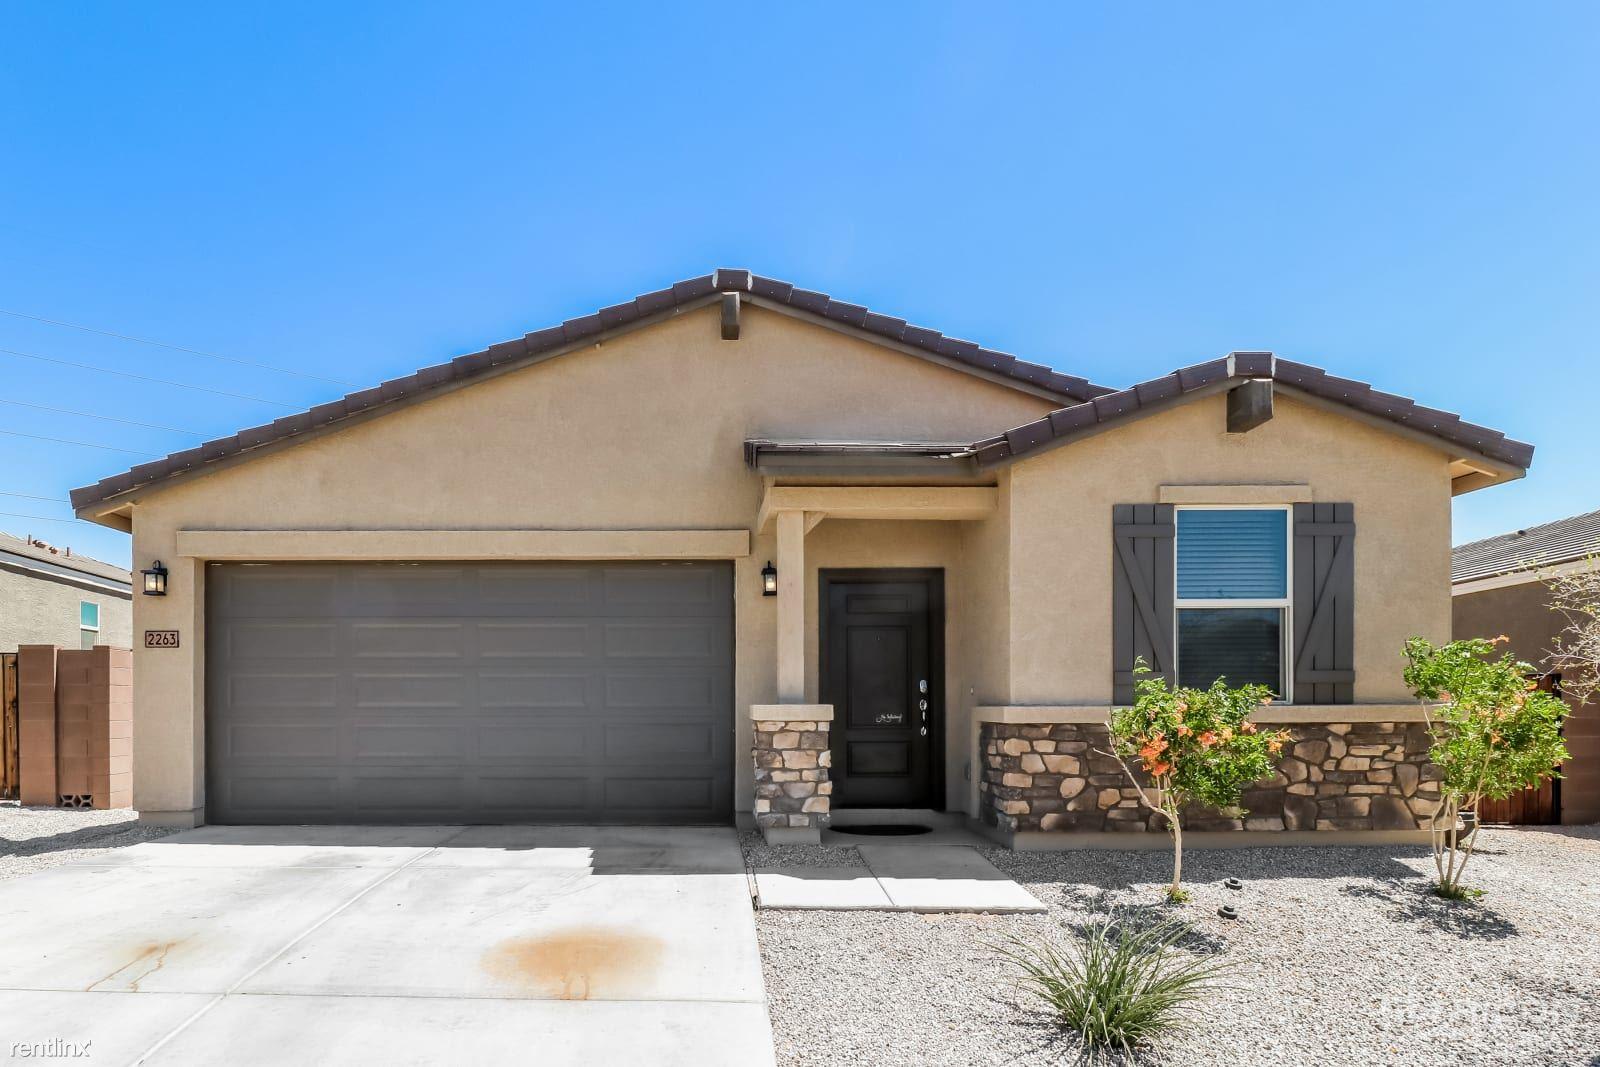 2263 S 236th Drive, Buckeye, AZ - 1,950 USD/ month